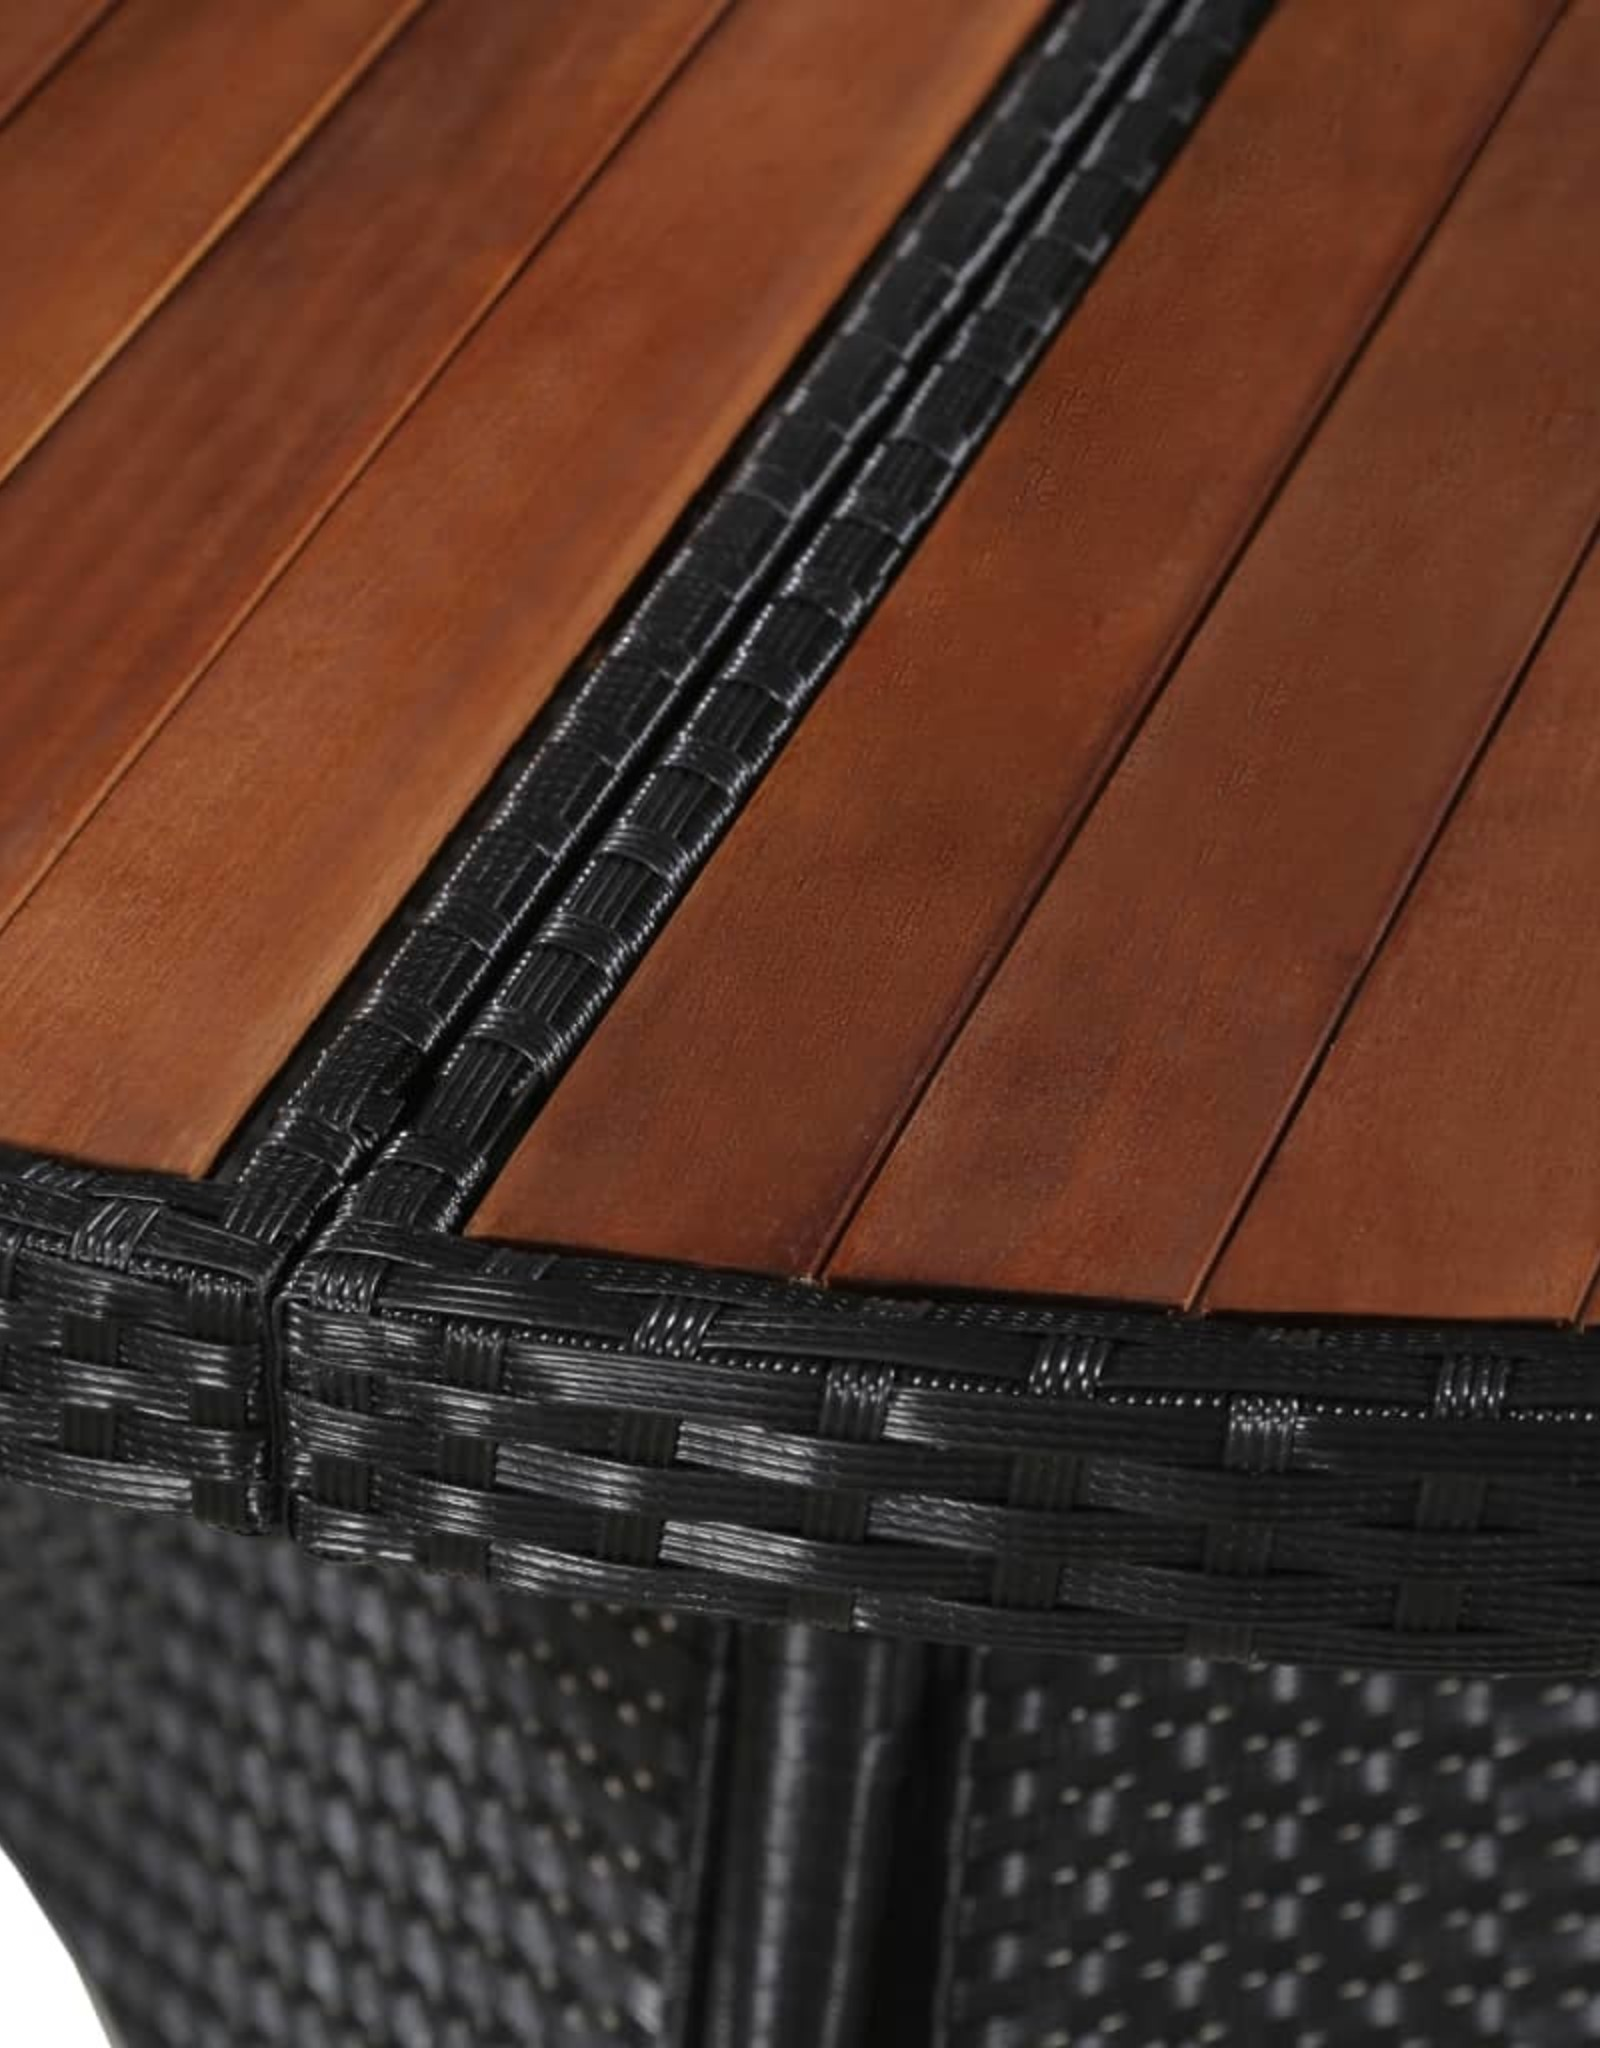 vidaXL 11-delige Tuinset poly rattan en acaciahout zwart